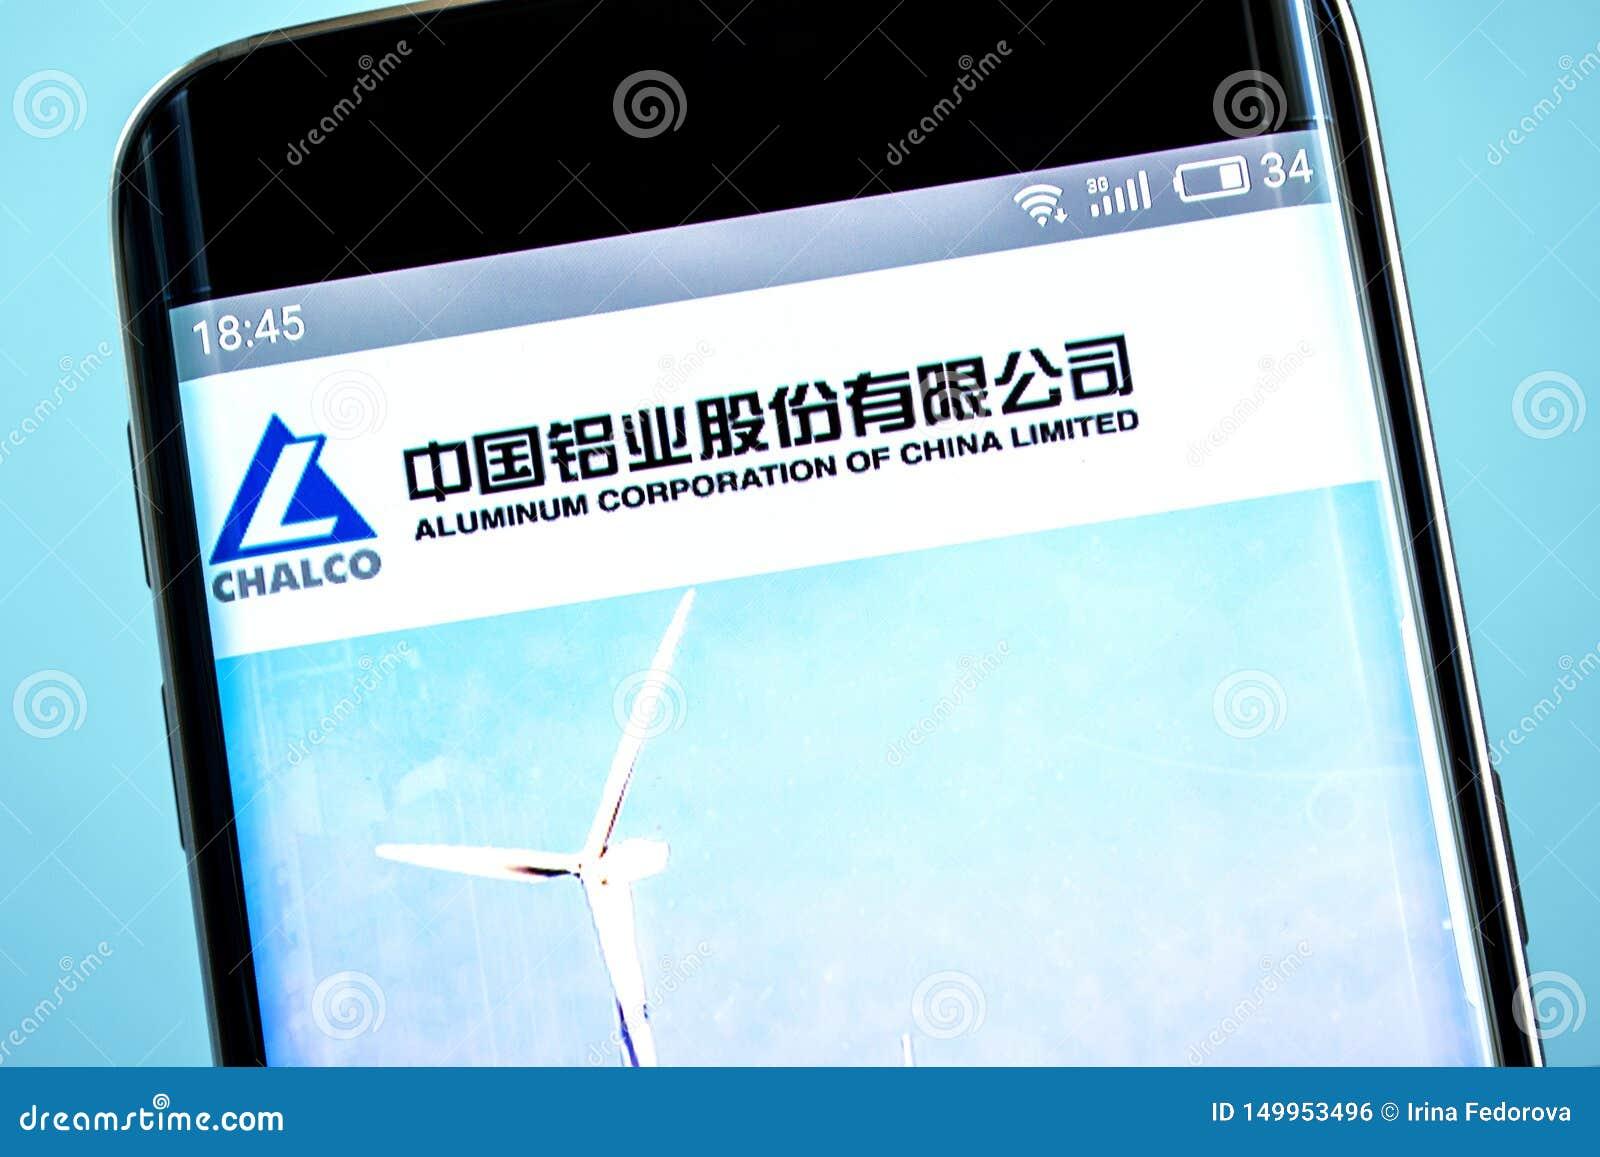 Berdyansk, Ukraine - 6 June 2019: Illustrative Editorial of Aluminum Corporation of China Limited website homepage. Aluminum